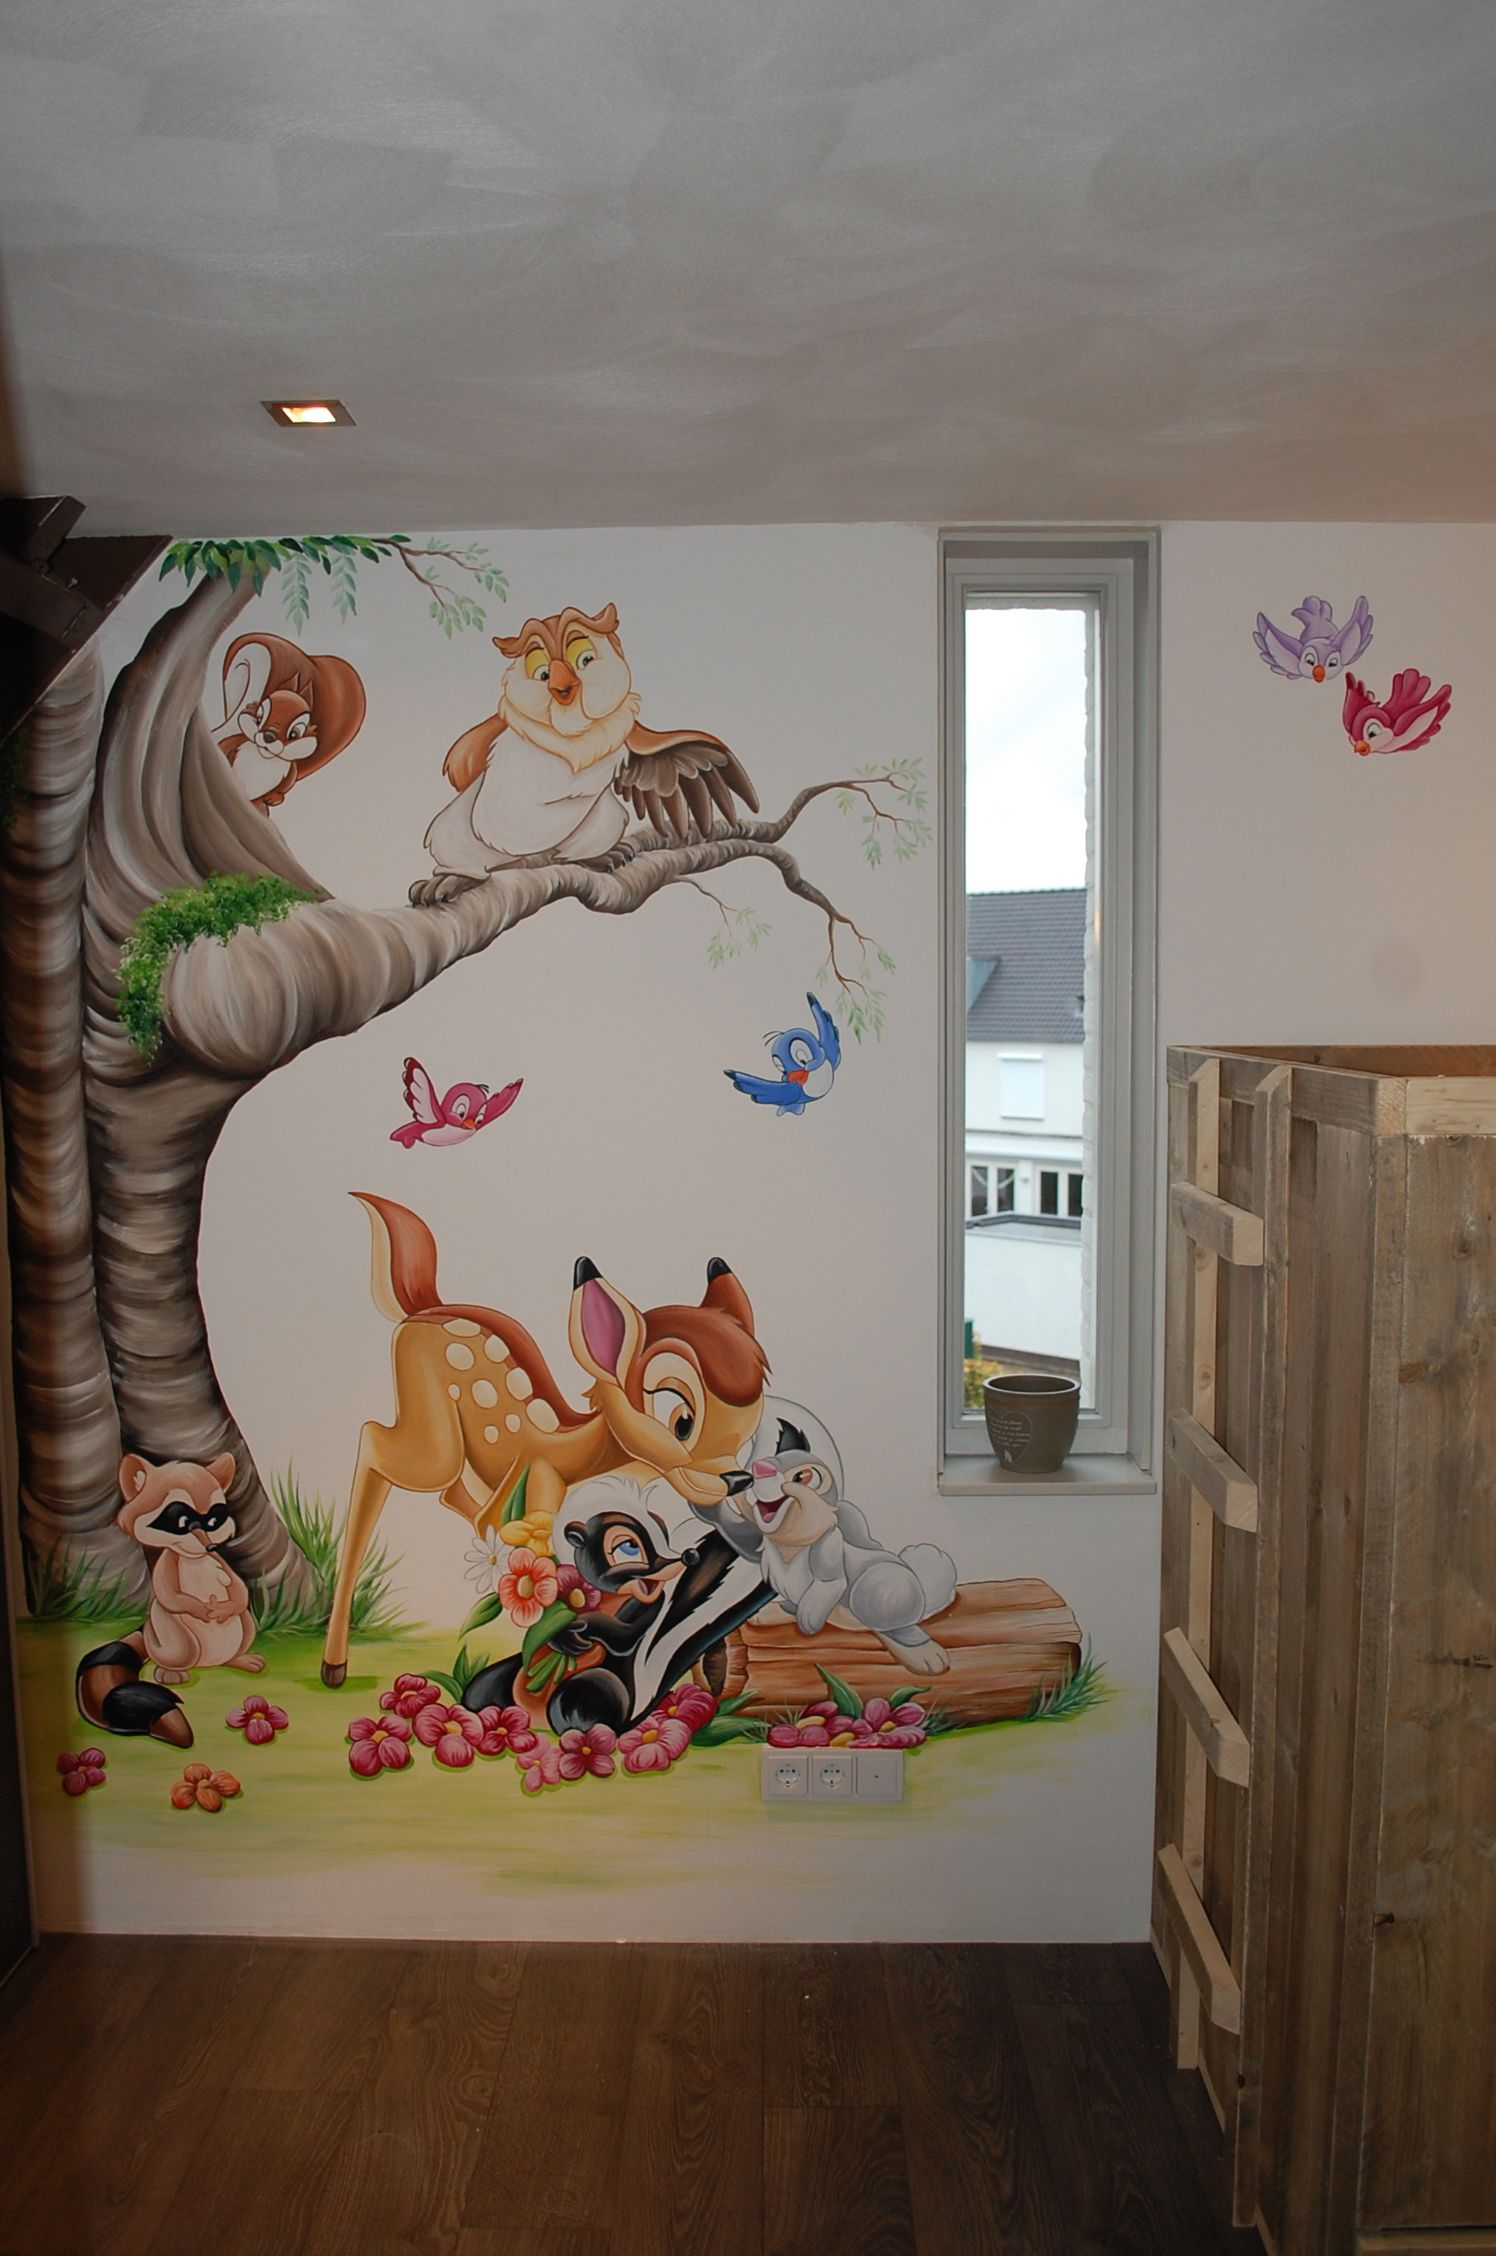 Bambi stampertje bloem muurschildering disney - Disney kinderzimmer ...